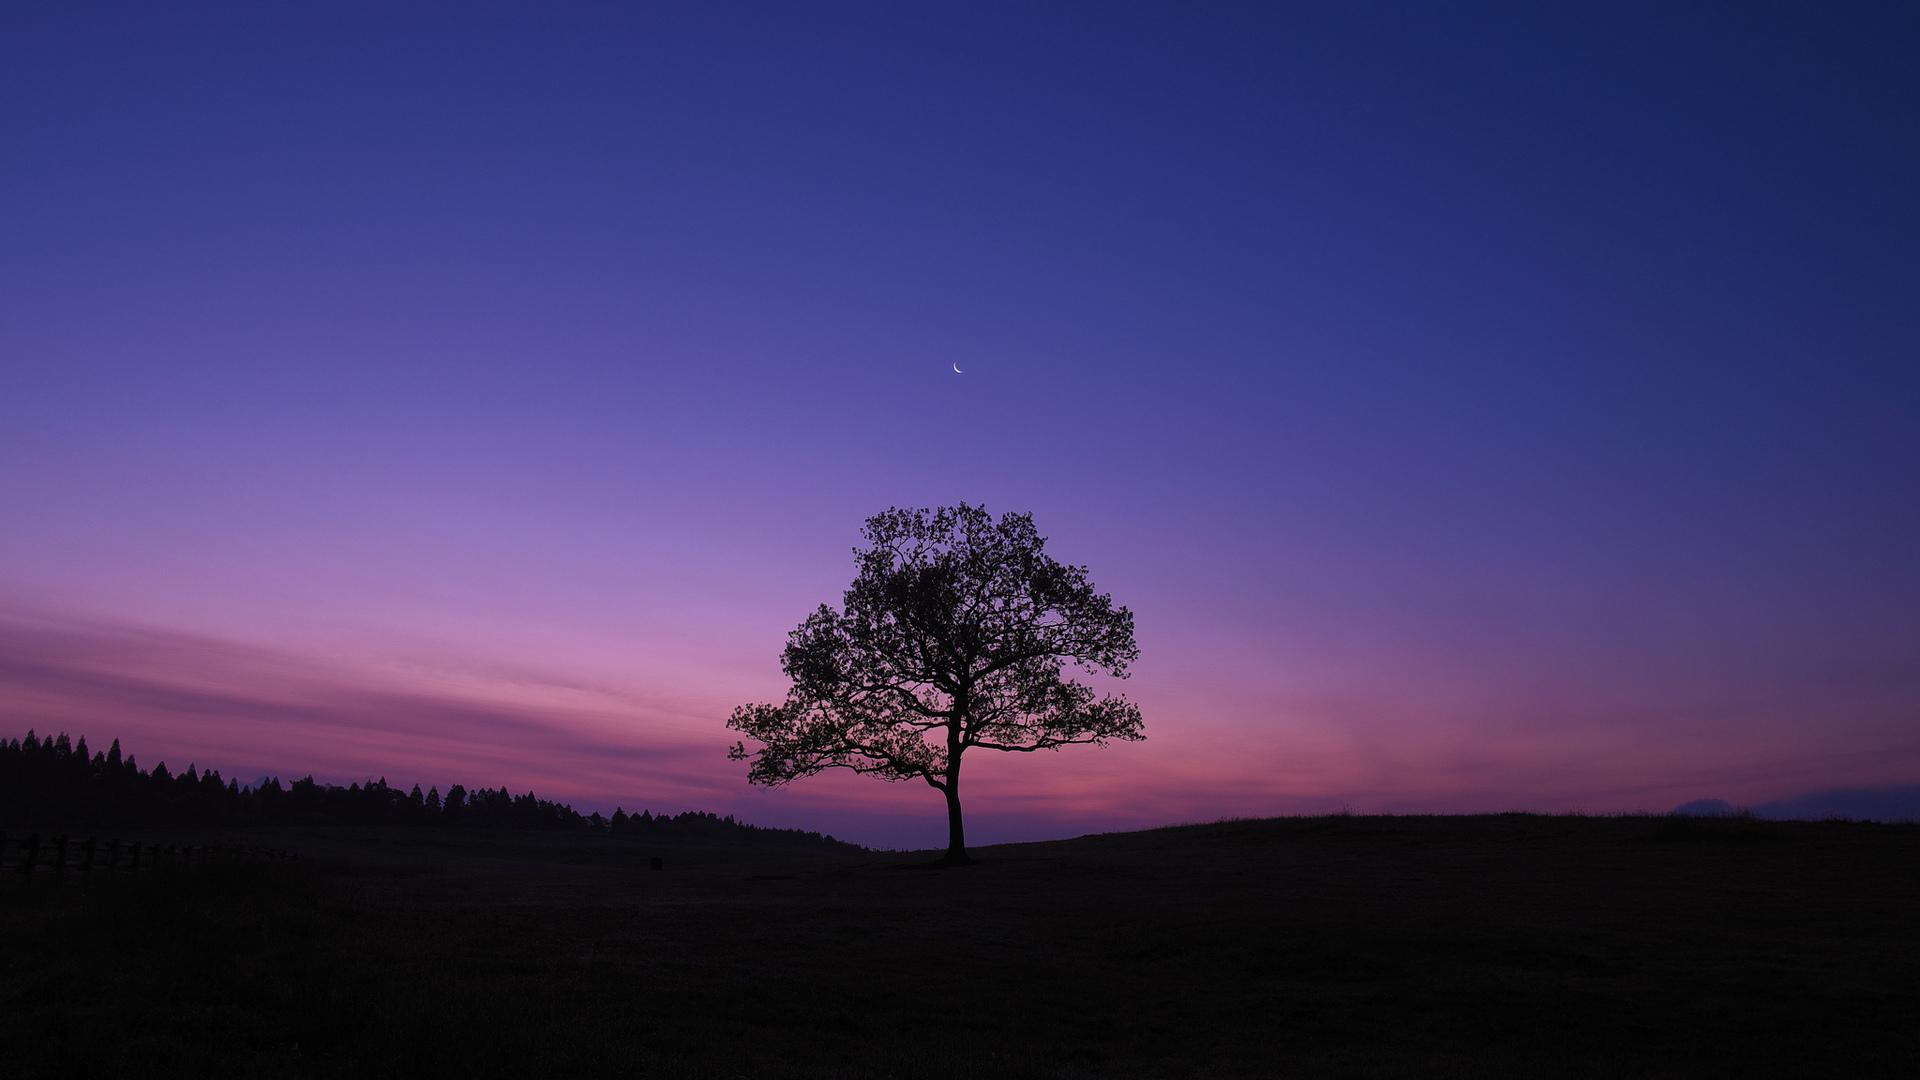 1920x1080 dark sky tree purple sky nature laptop full hd 1080p hd 4k